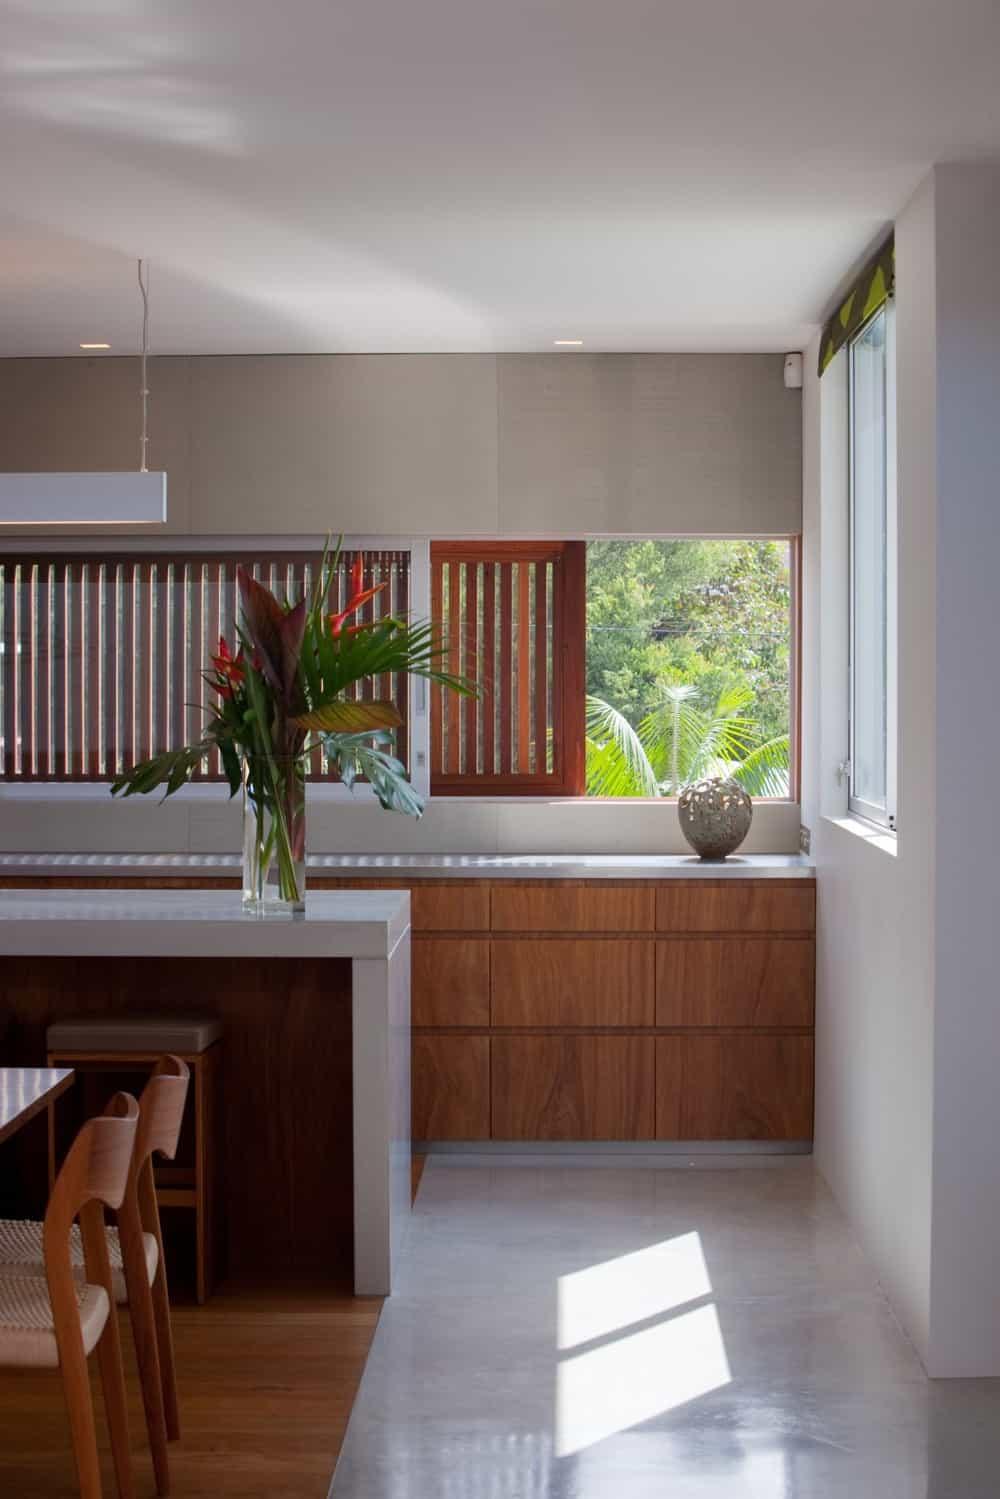 Kitchen with modern asian design, modern asian architecture, Virginia Kerridge, White Rock